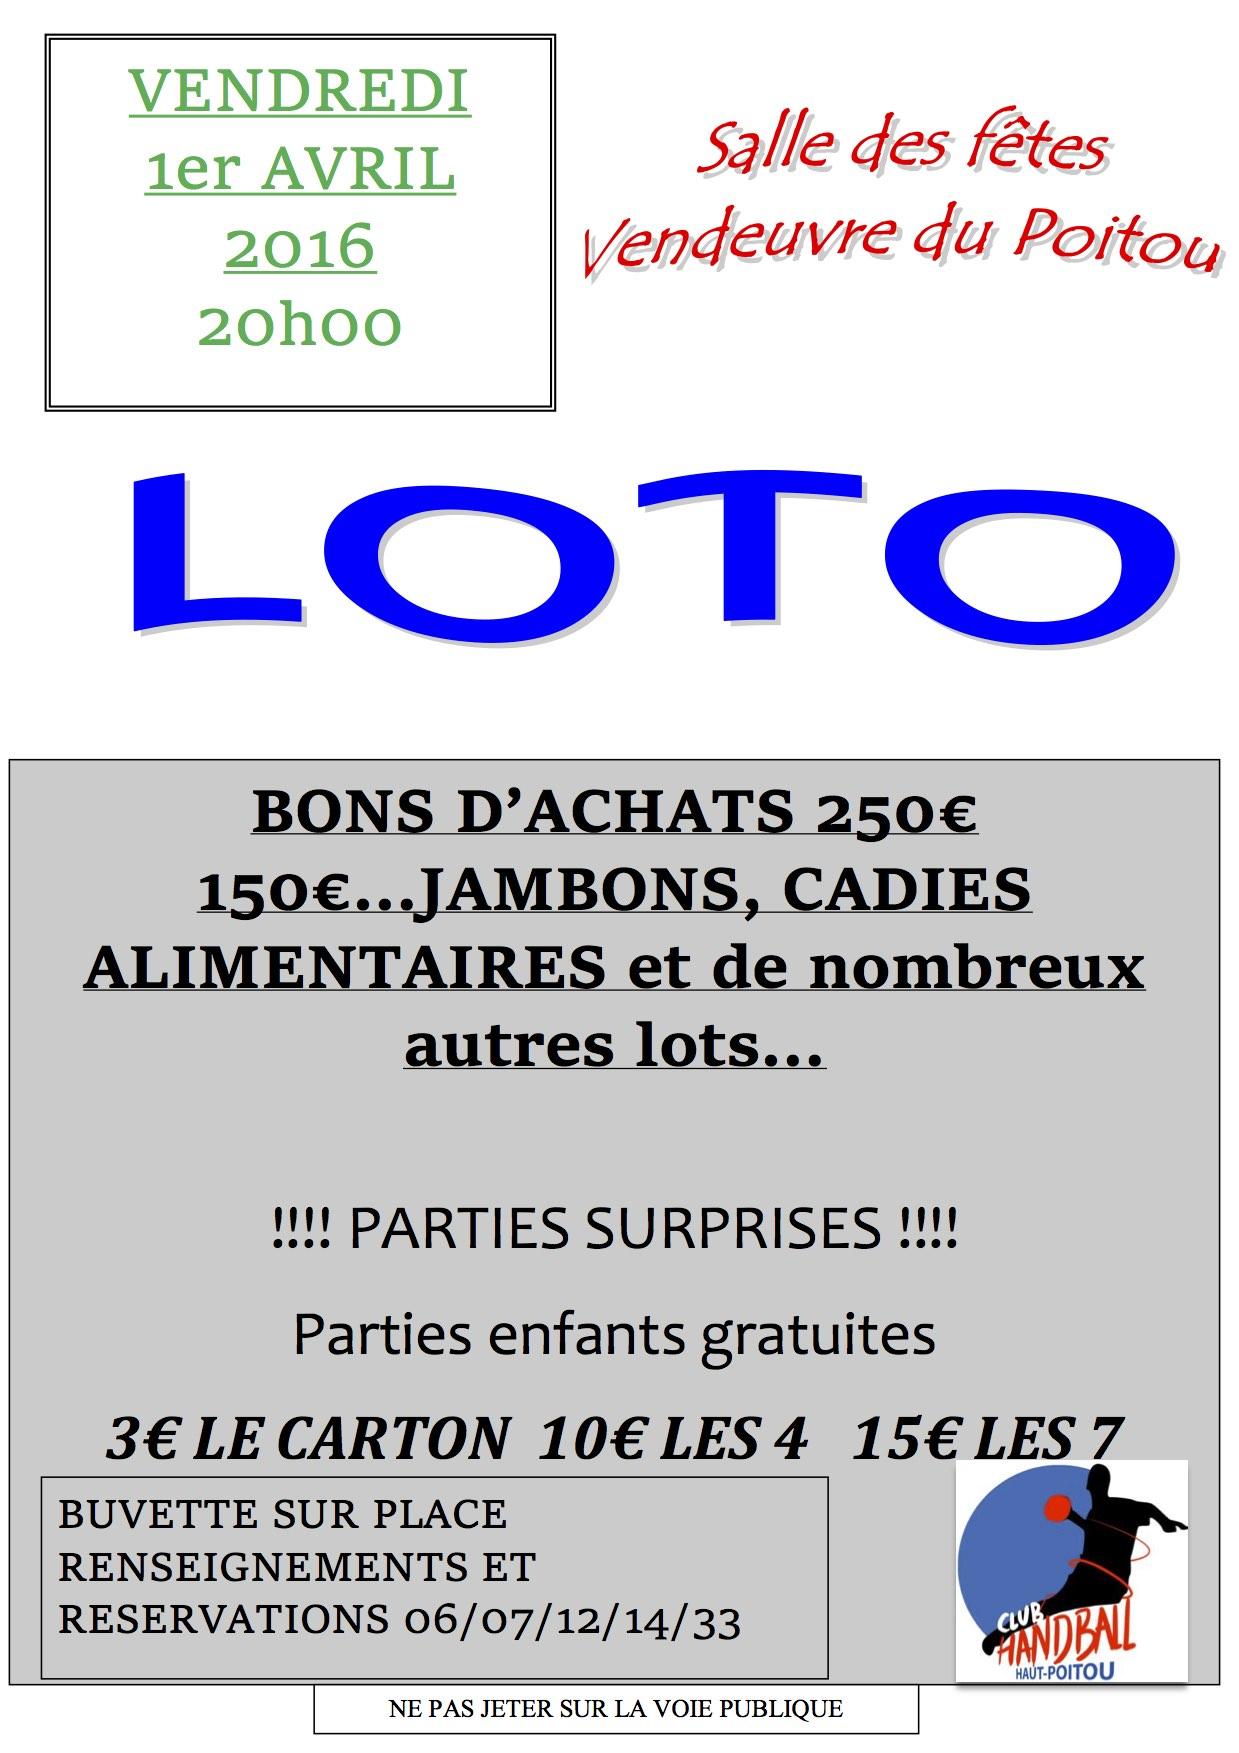 Affiche loto CHHP 1 avril 2016 Vendeuvre